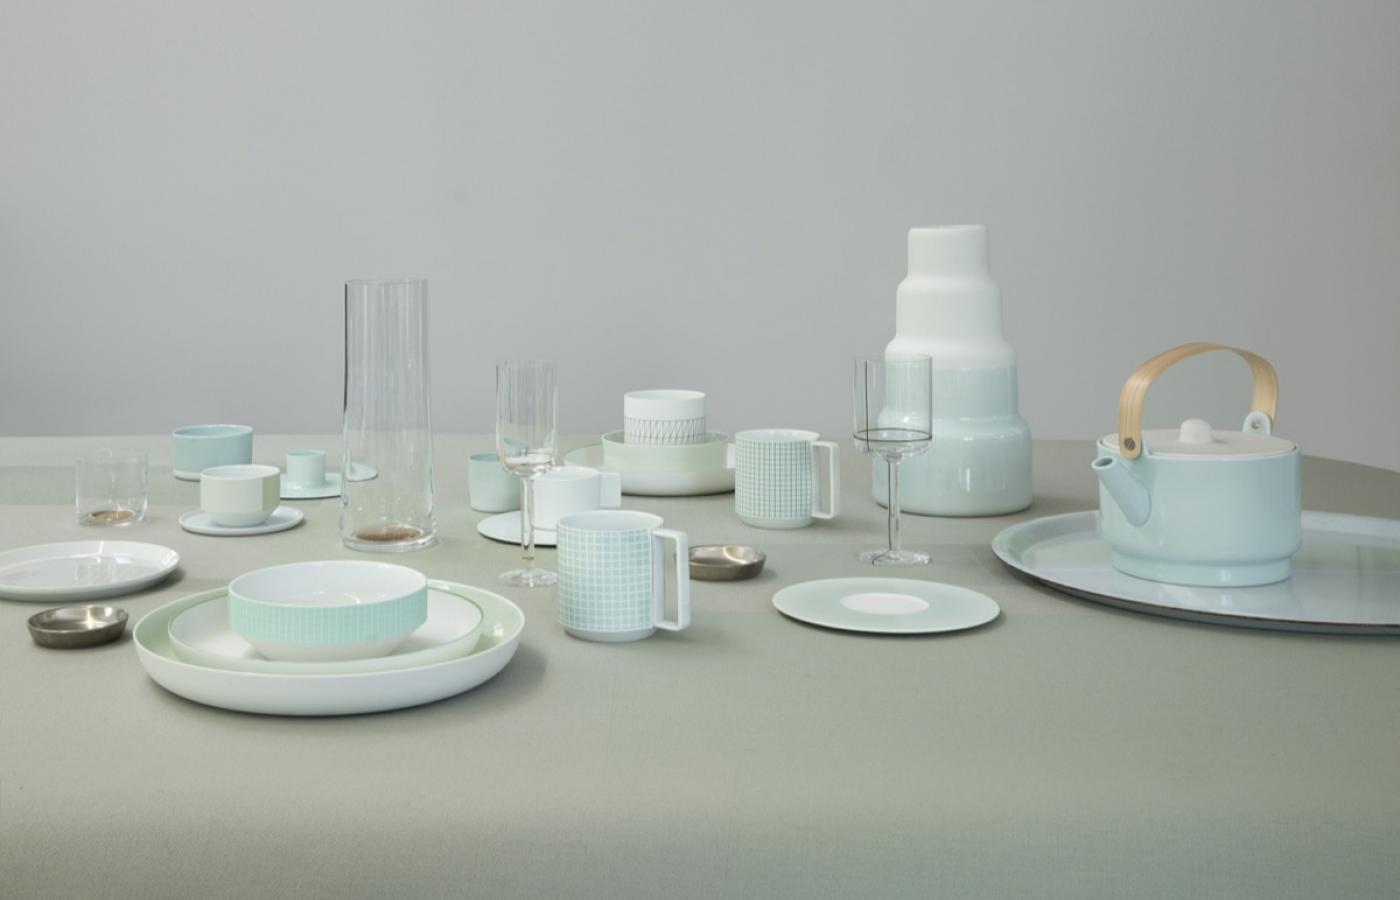 Royal Copenhagen Vases Of Https Www Admagazine Fr Design Actualite Design Diaporama Un with Regard to Scholten Baijings fortnum Mason Time for Tea Table Setting Jpg 5424 Jpeg 4283